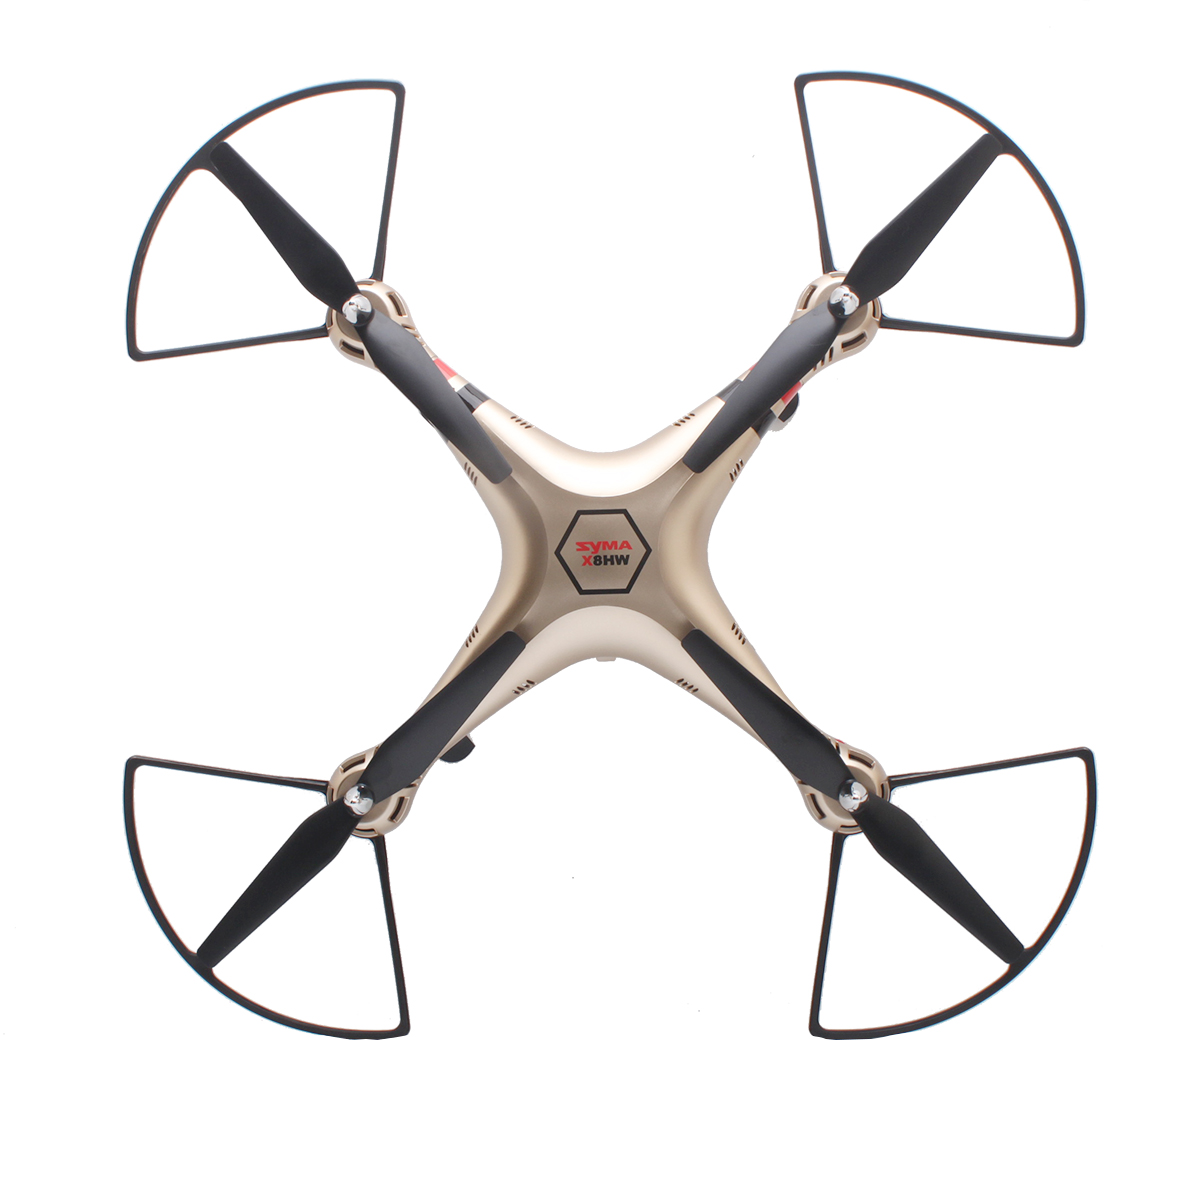 Tout nouveau Drone gyrorotor RC quadrirotor SYMA X8HC 2.4 Ghz 6 axes avec caméra Camra HD 2.0MP hélicoptère quadrirotor RC grand Angle VS X8C - 2